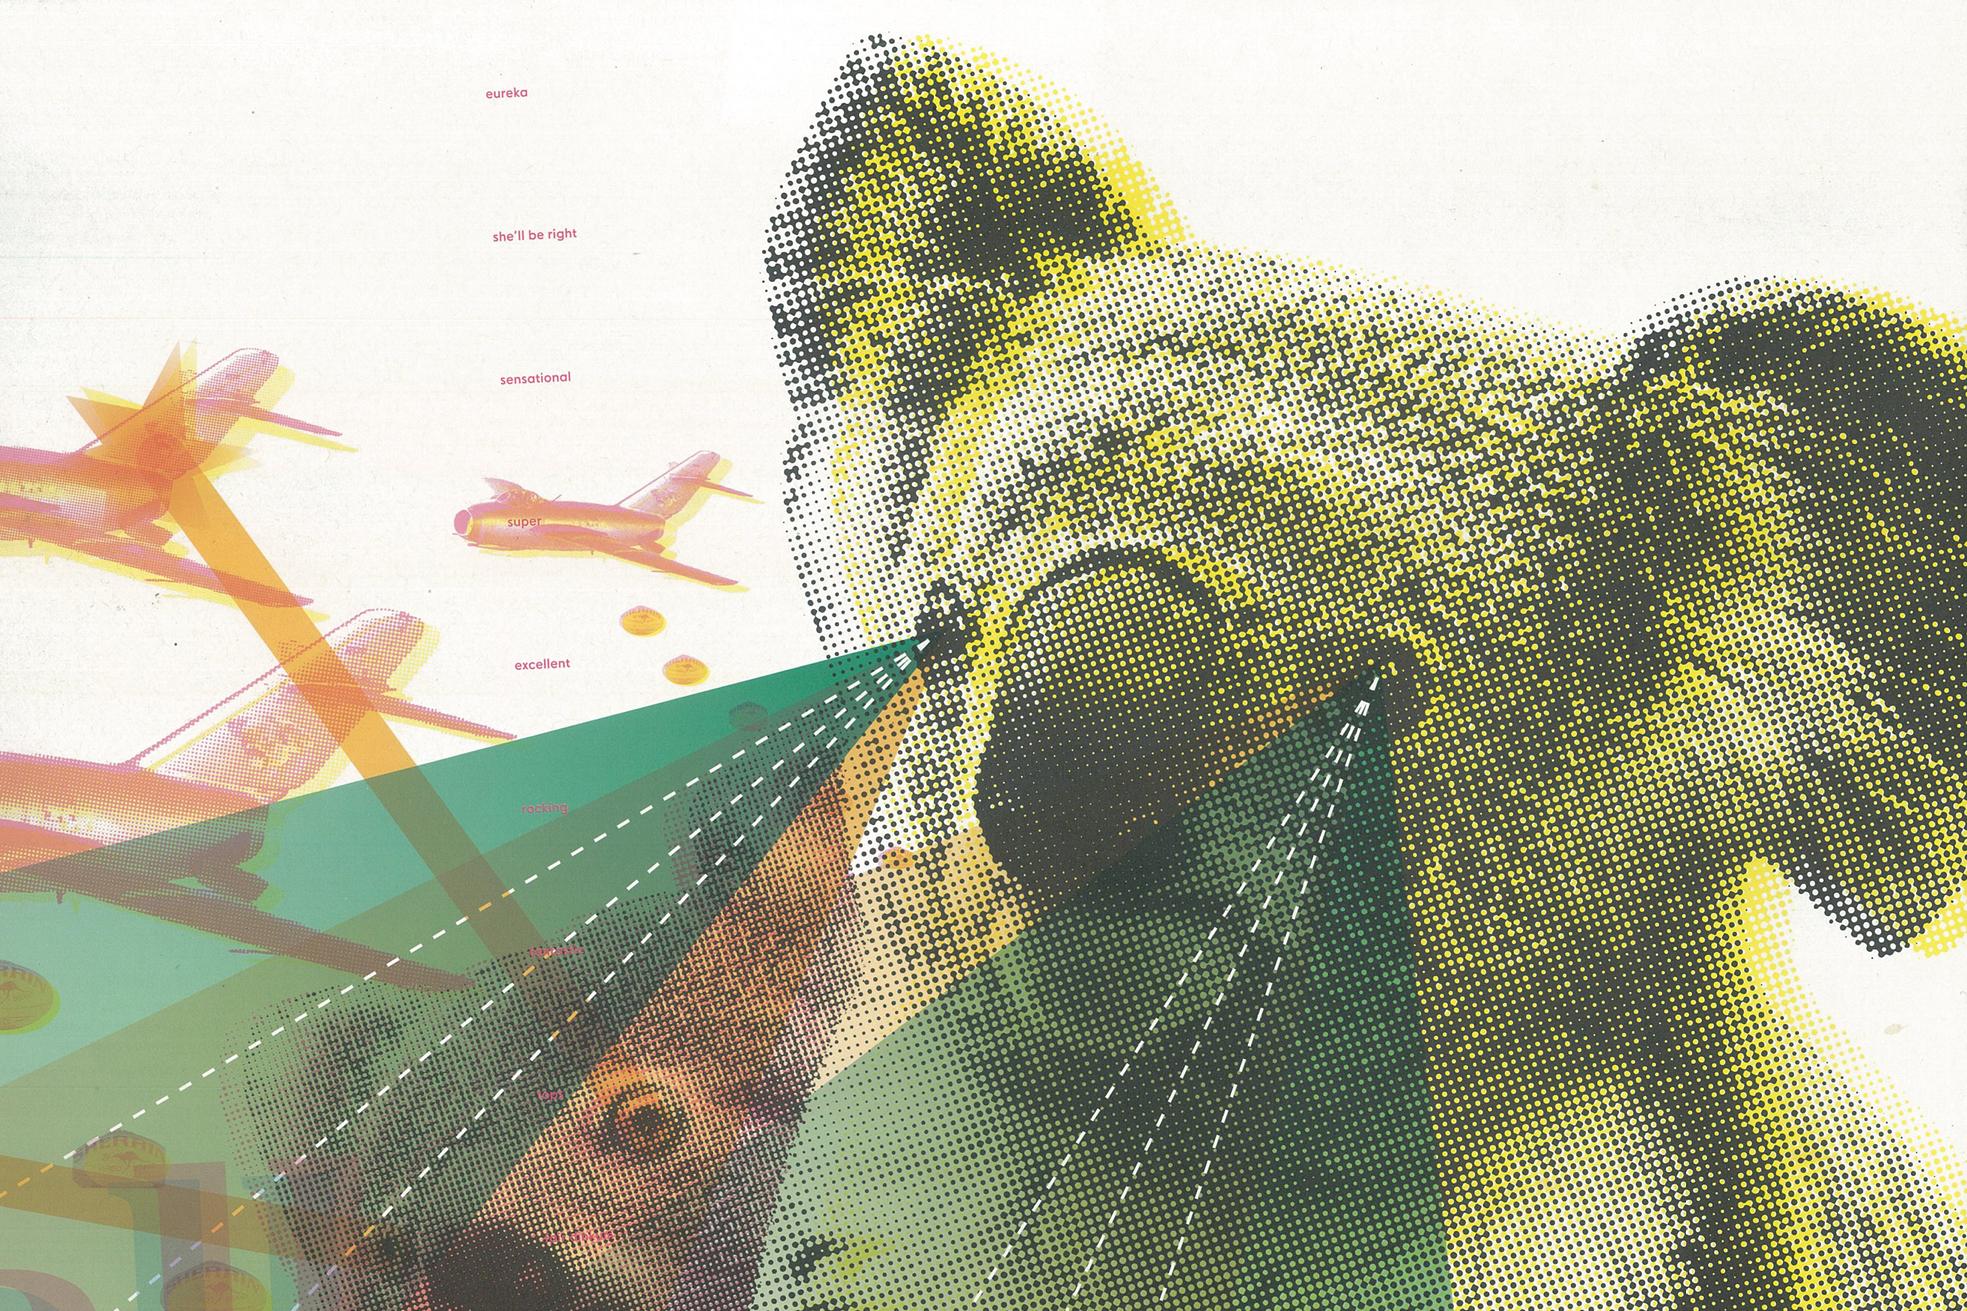 whwWeb_About_whw_Activities_AU_Brisbane_Optimism_Poster cu.jpg